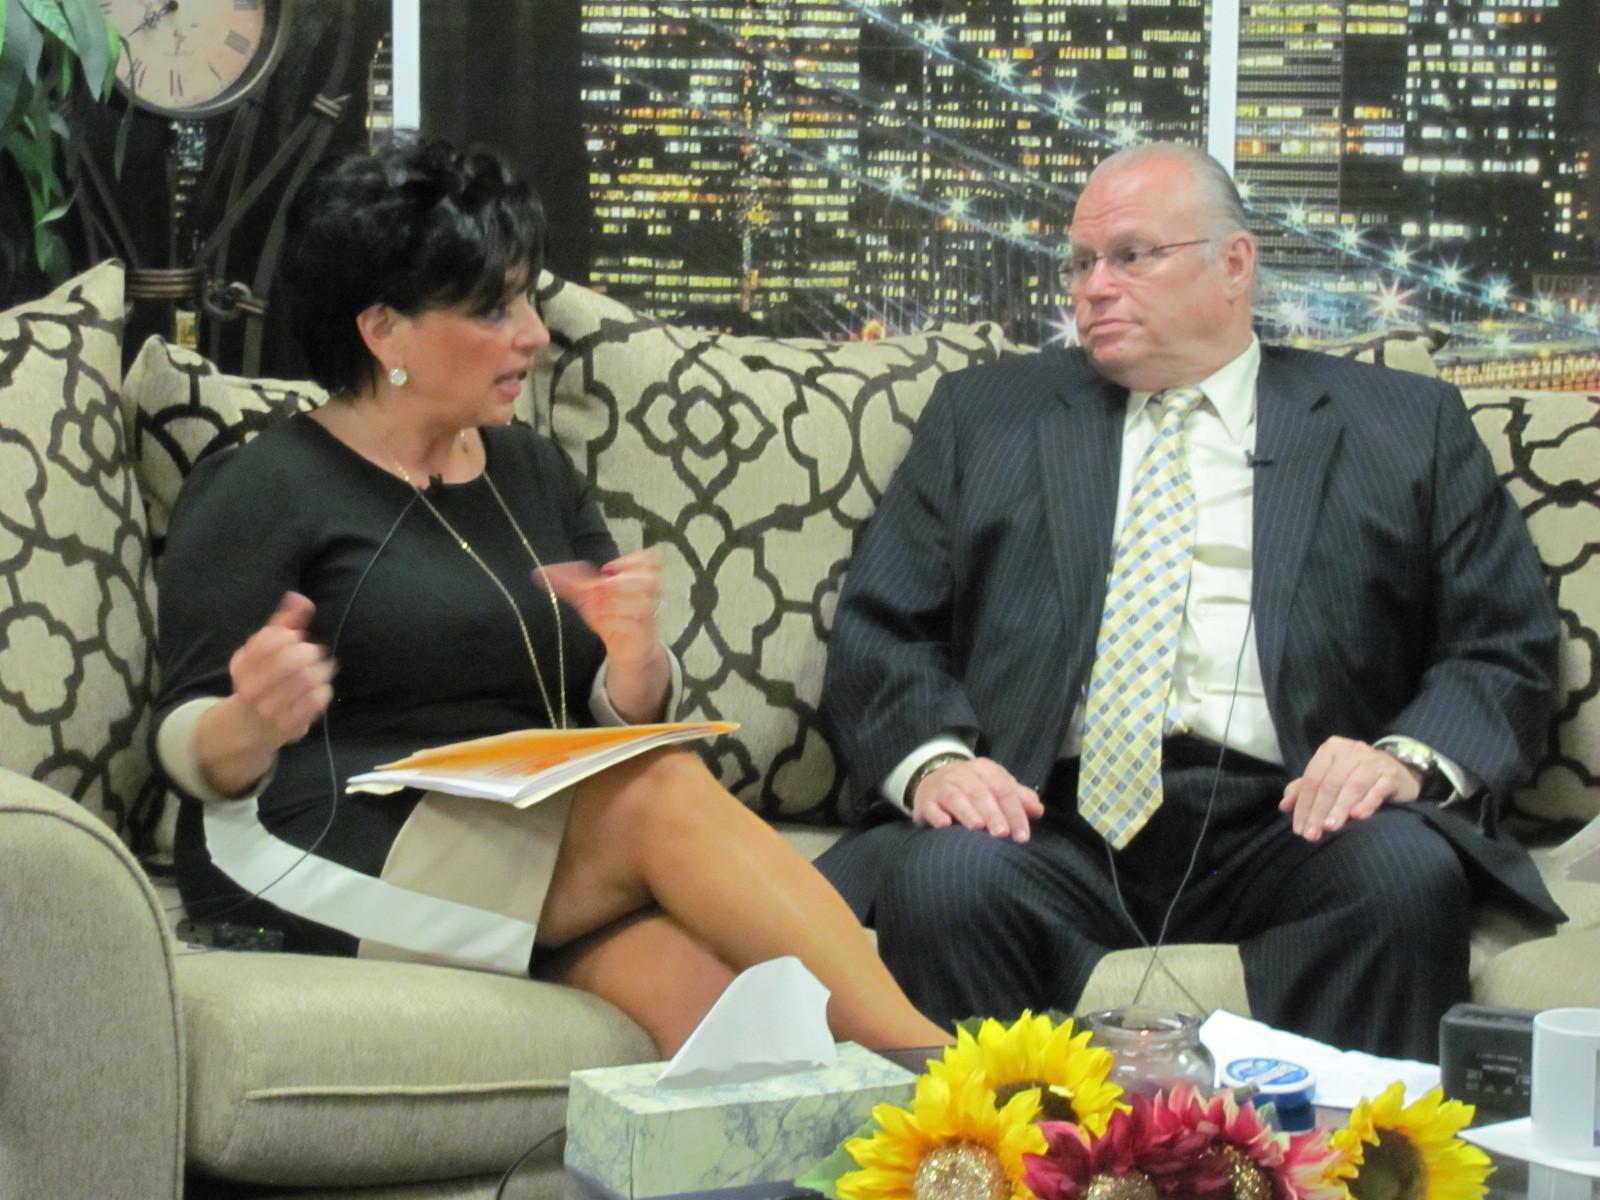 June 24 Show Mickey Linda Interviewing.jpg